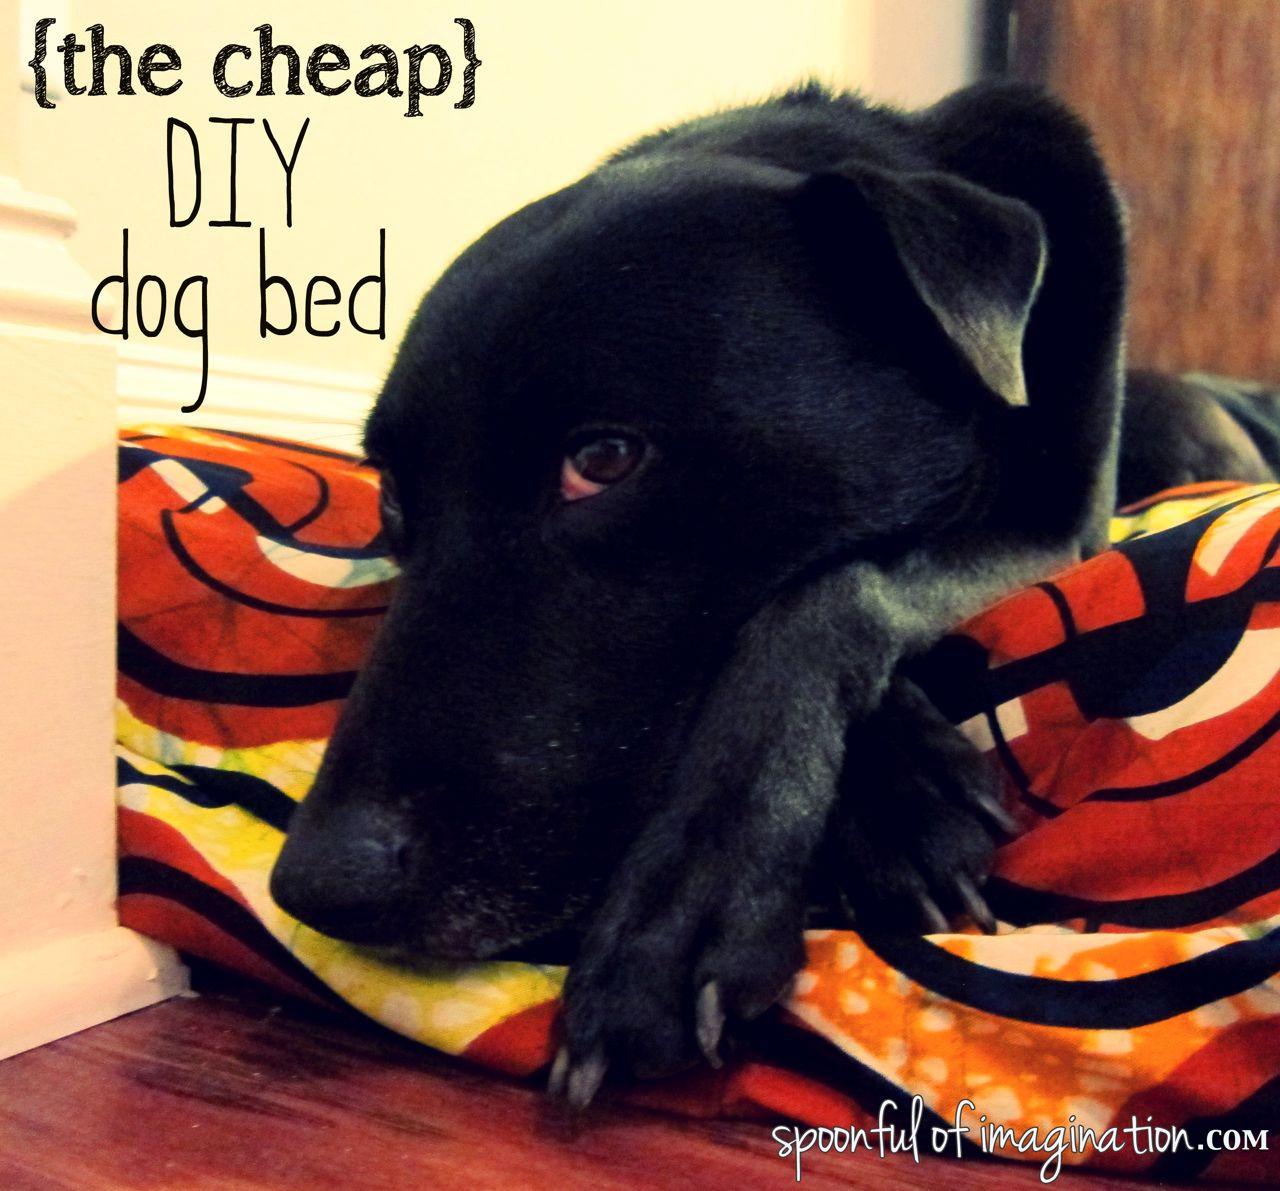 DIY Large Dog Beds  DIY Cheap Dog Bed Spoonful of Imagination